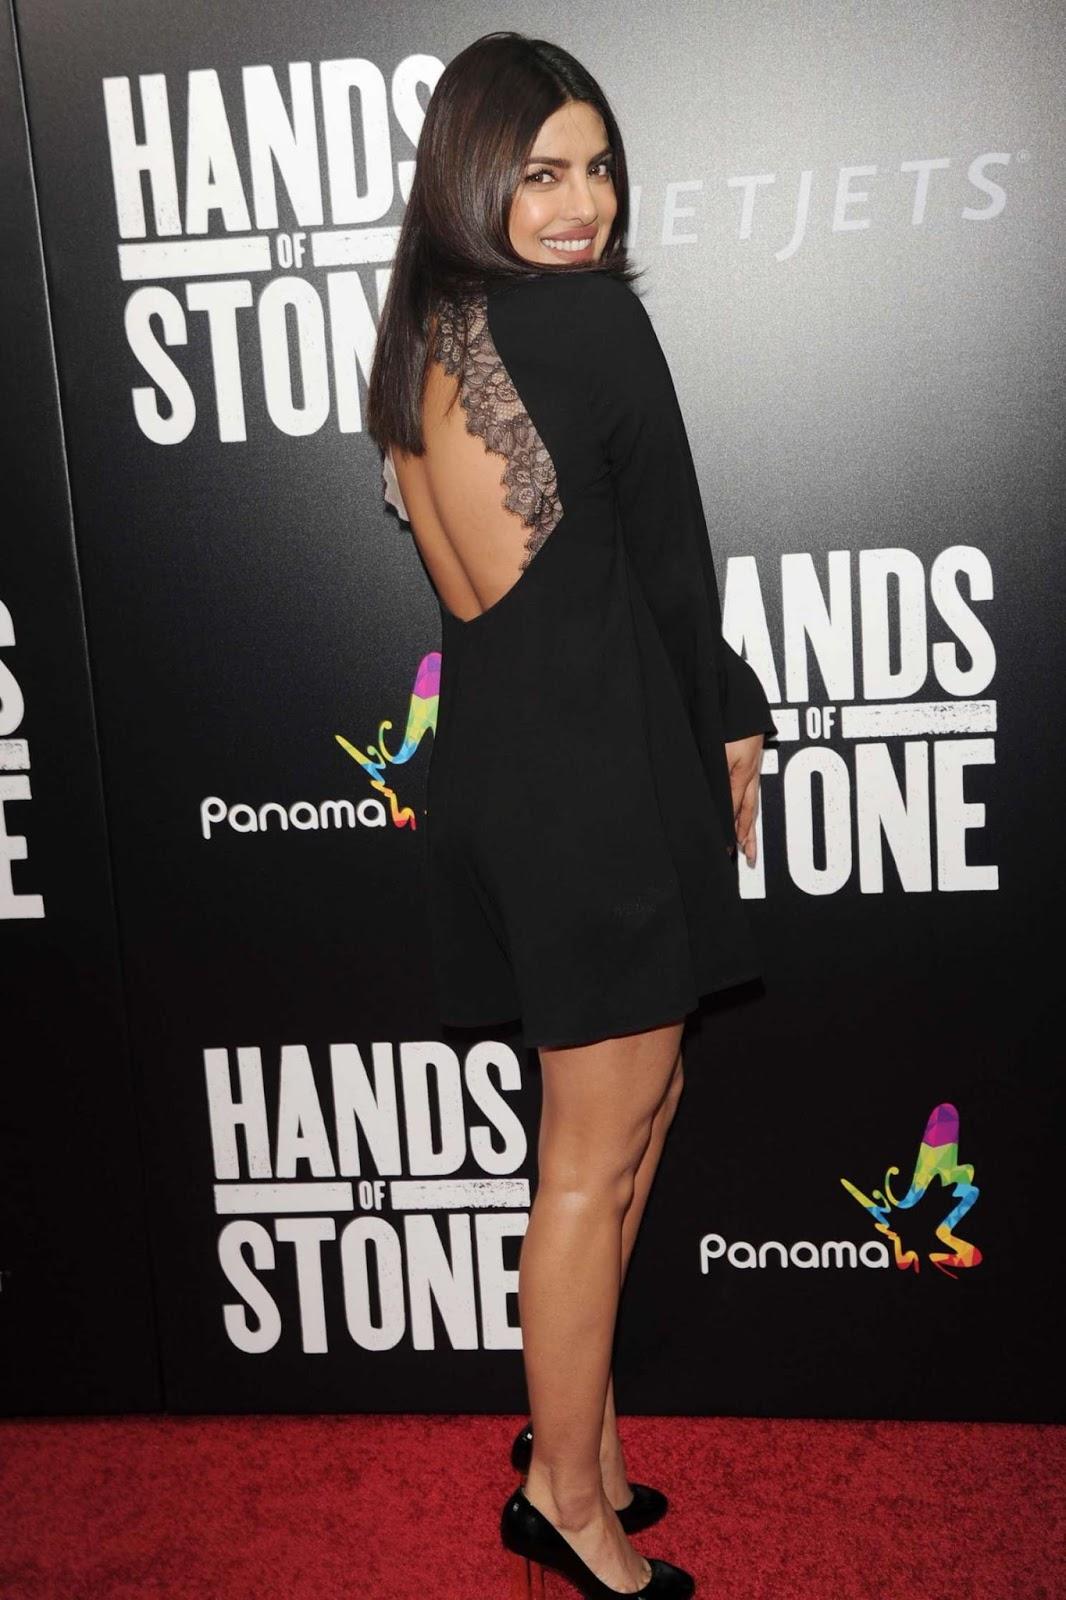 Priyanka Chopra Looks Stunning In A Black Dress